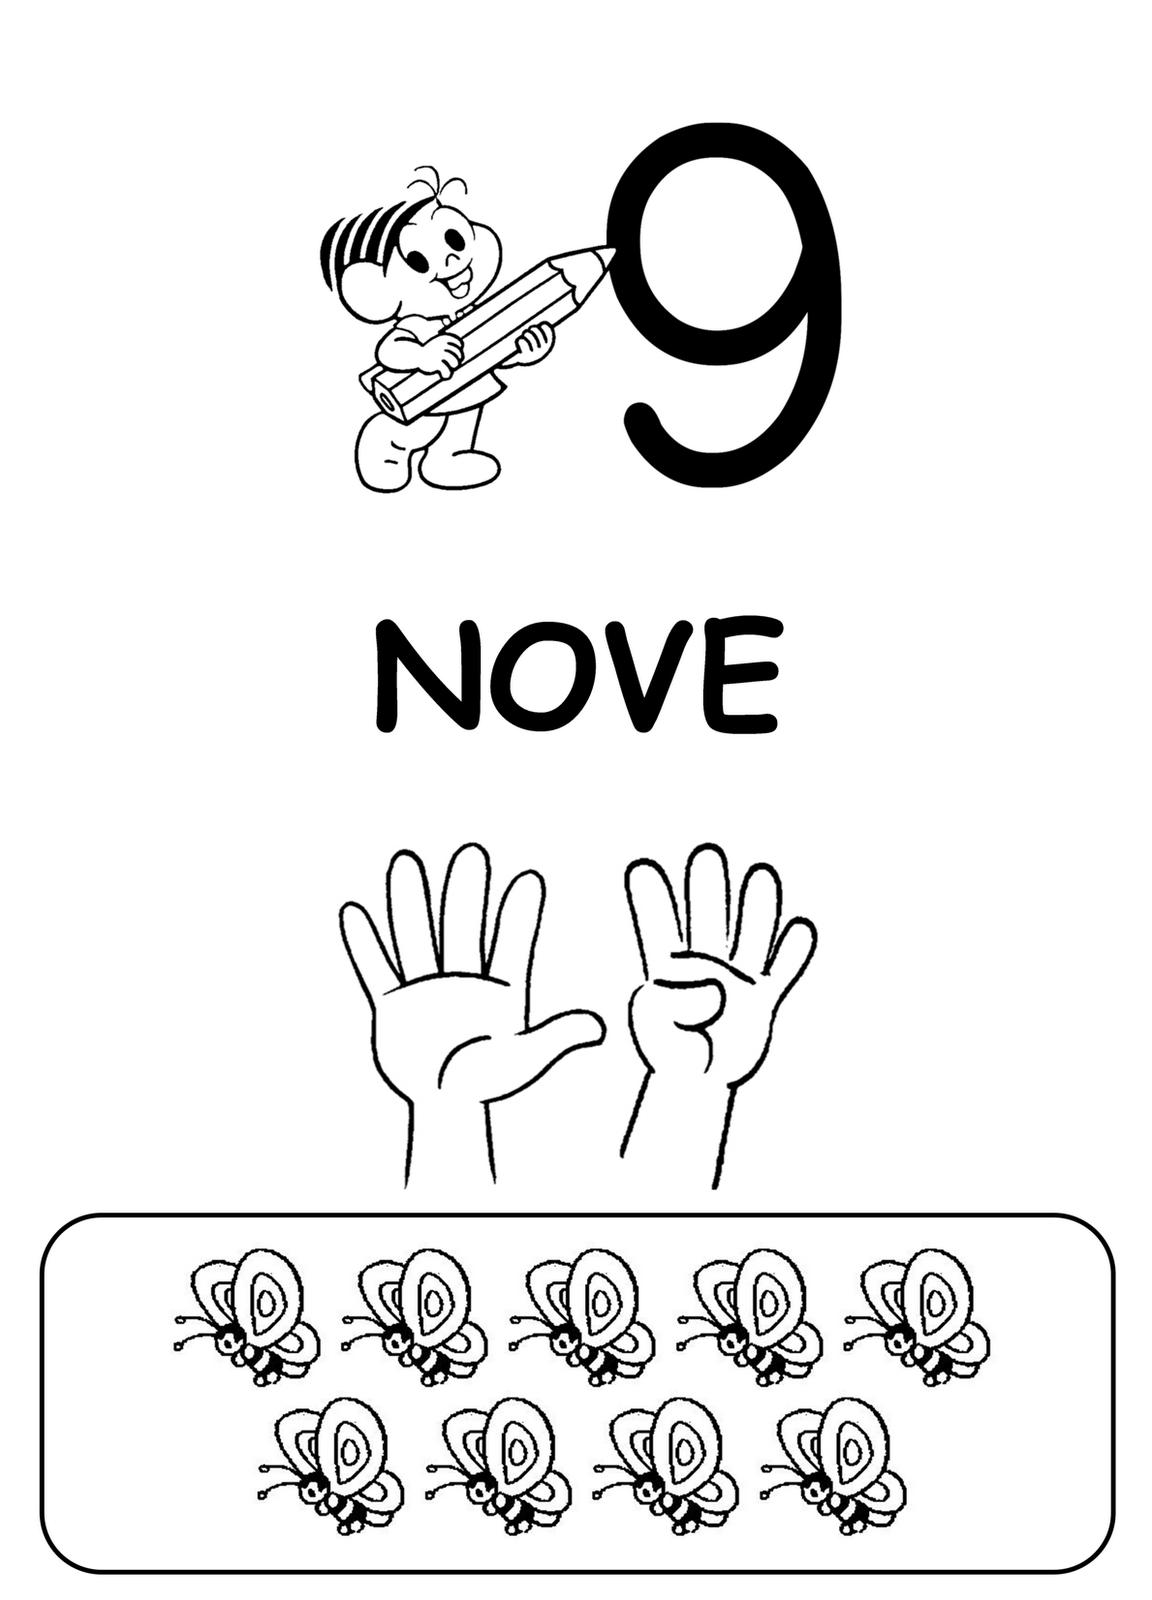 Desenho De Numero 9 E Letras Para Colorir Tudodesenhos